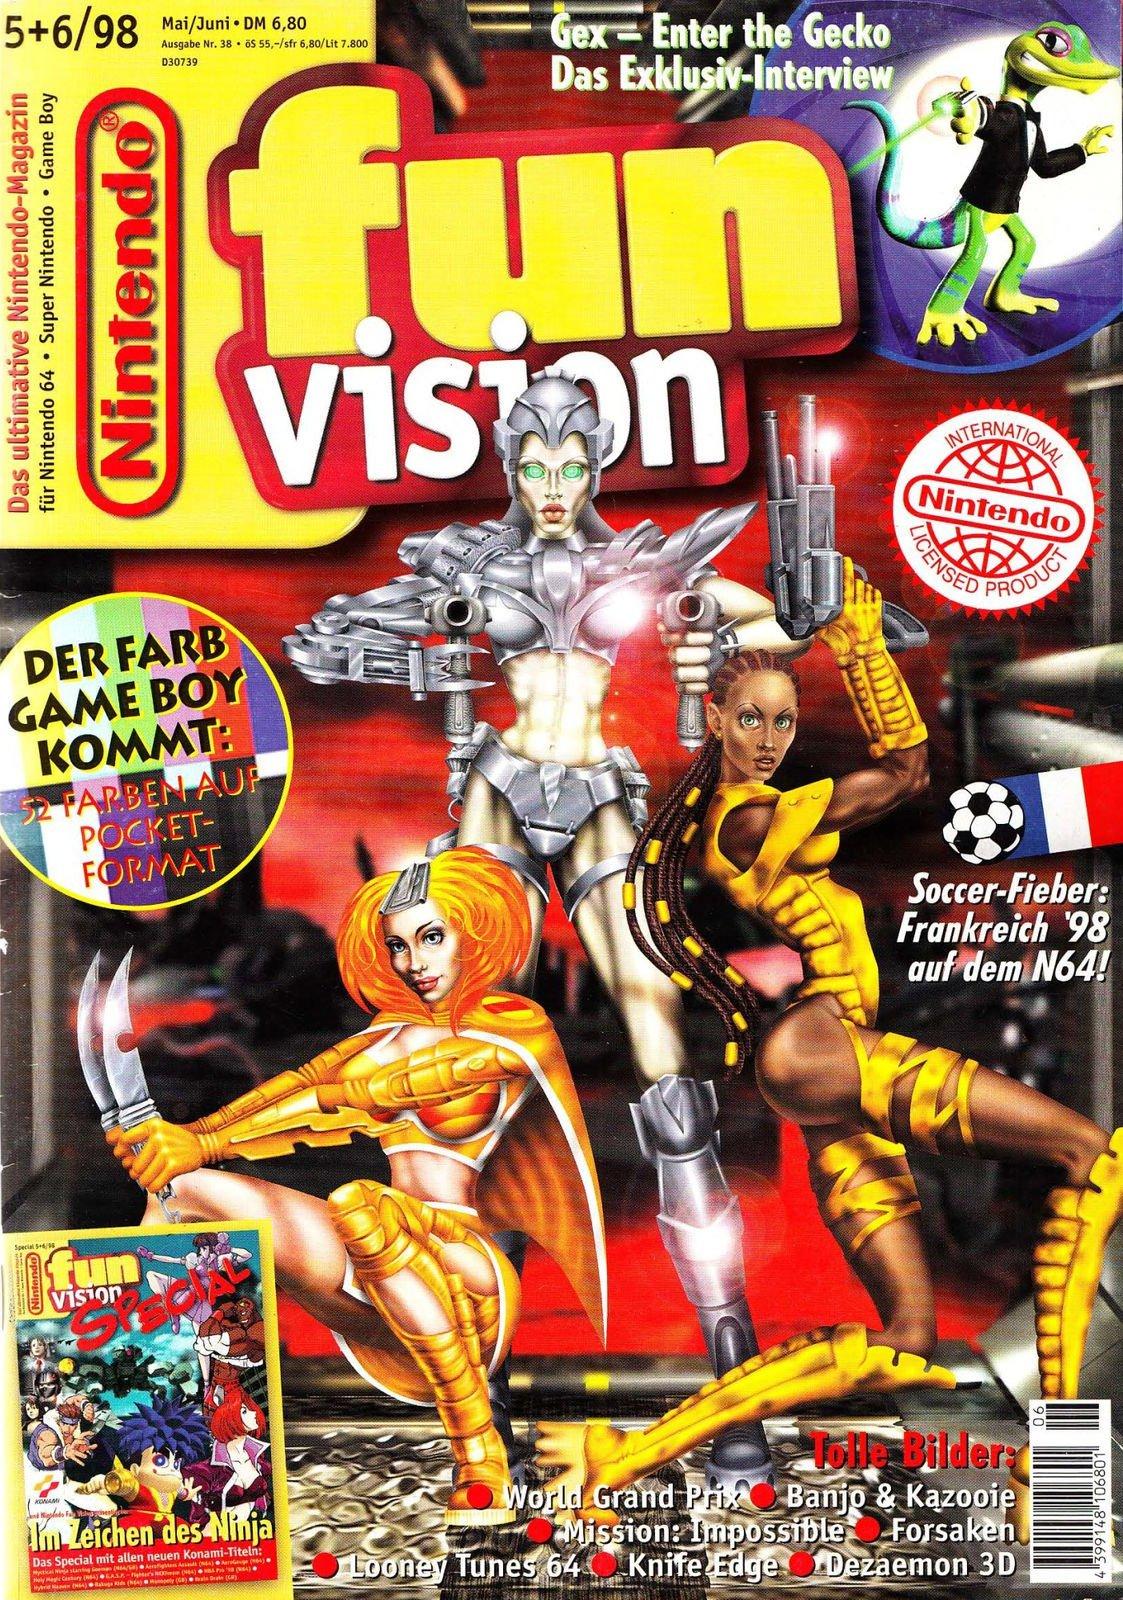 Nintendo Fun Vision Issue 50 (May / June 1998)